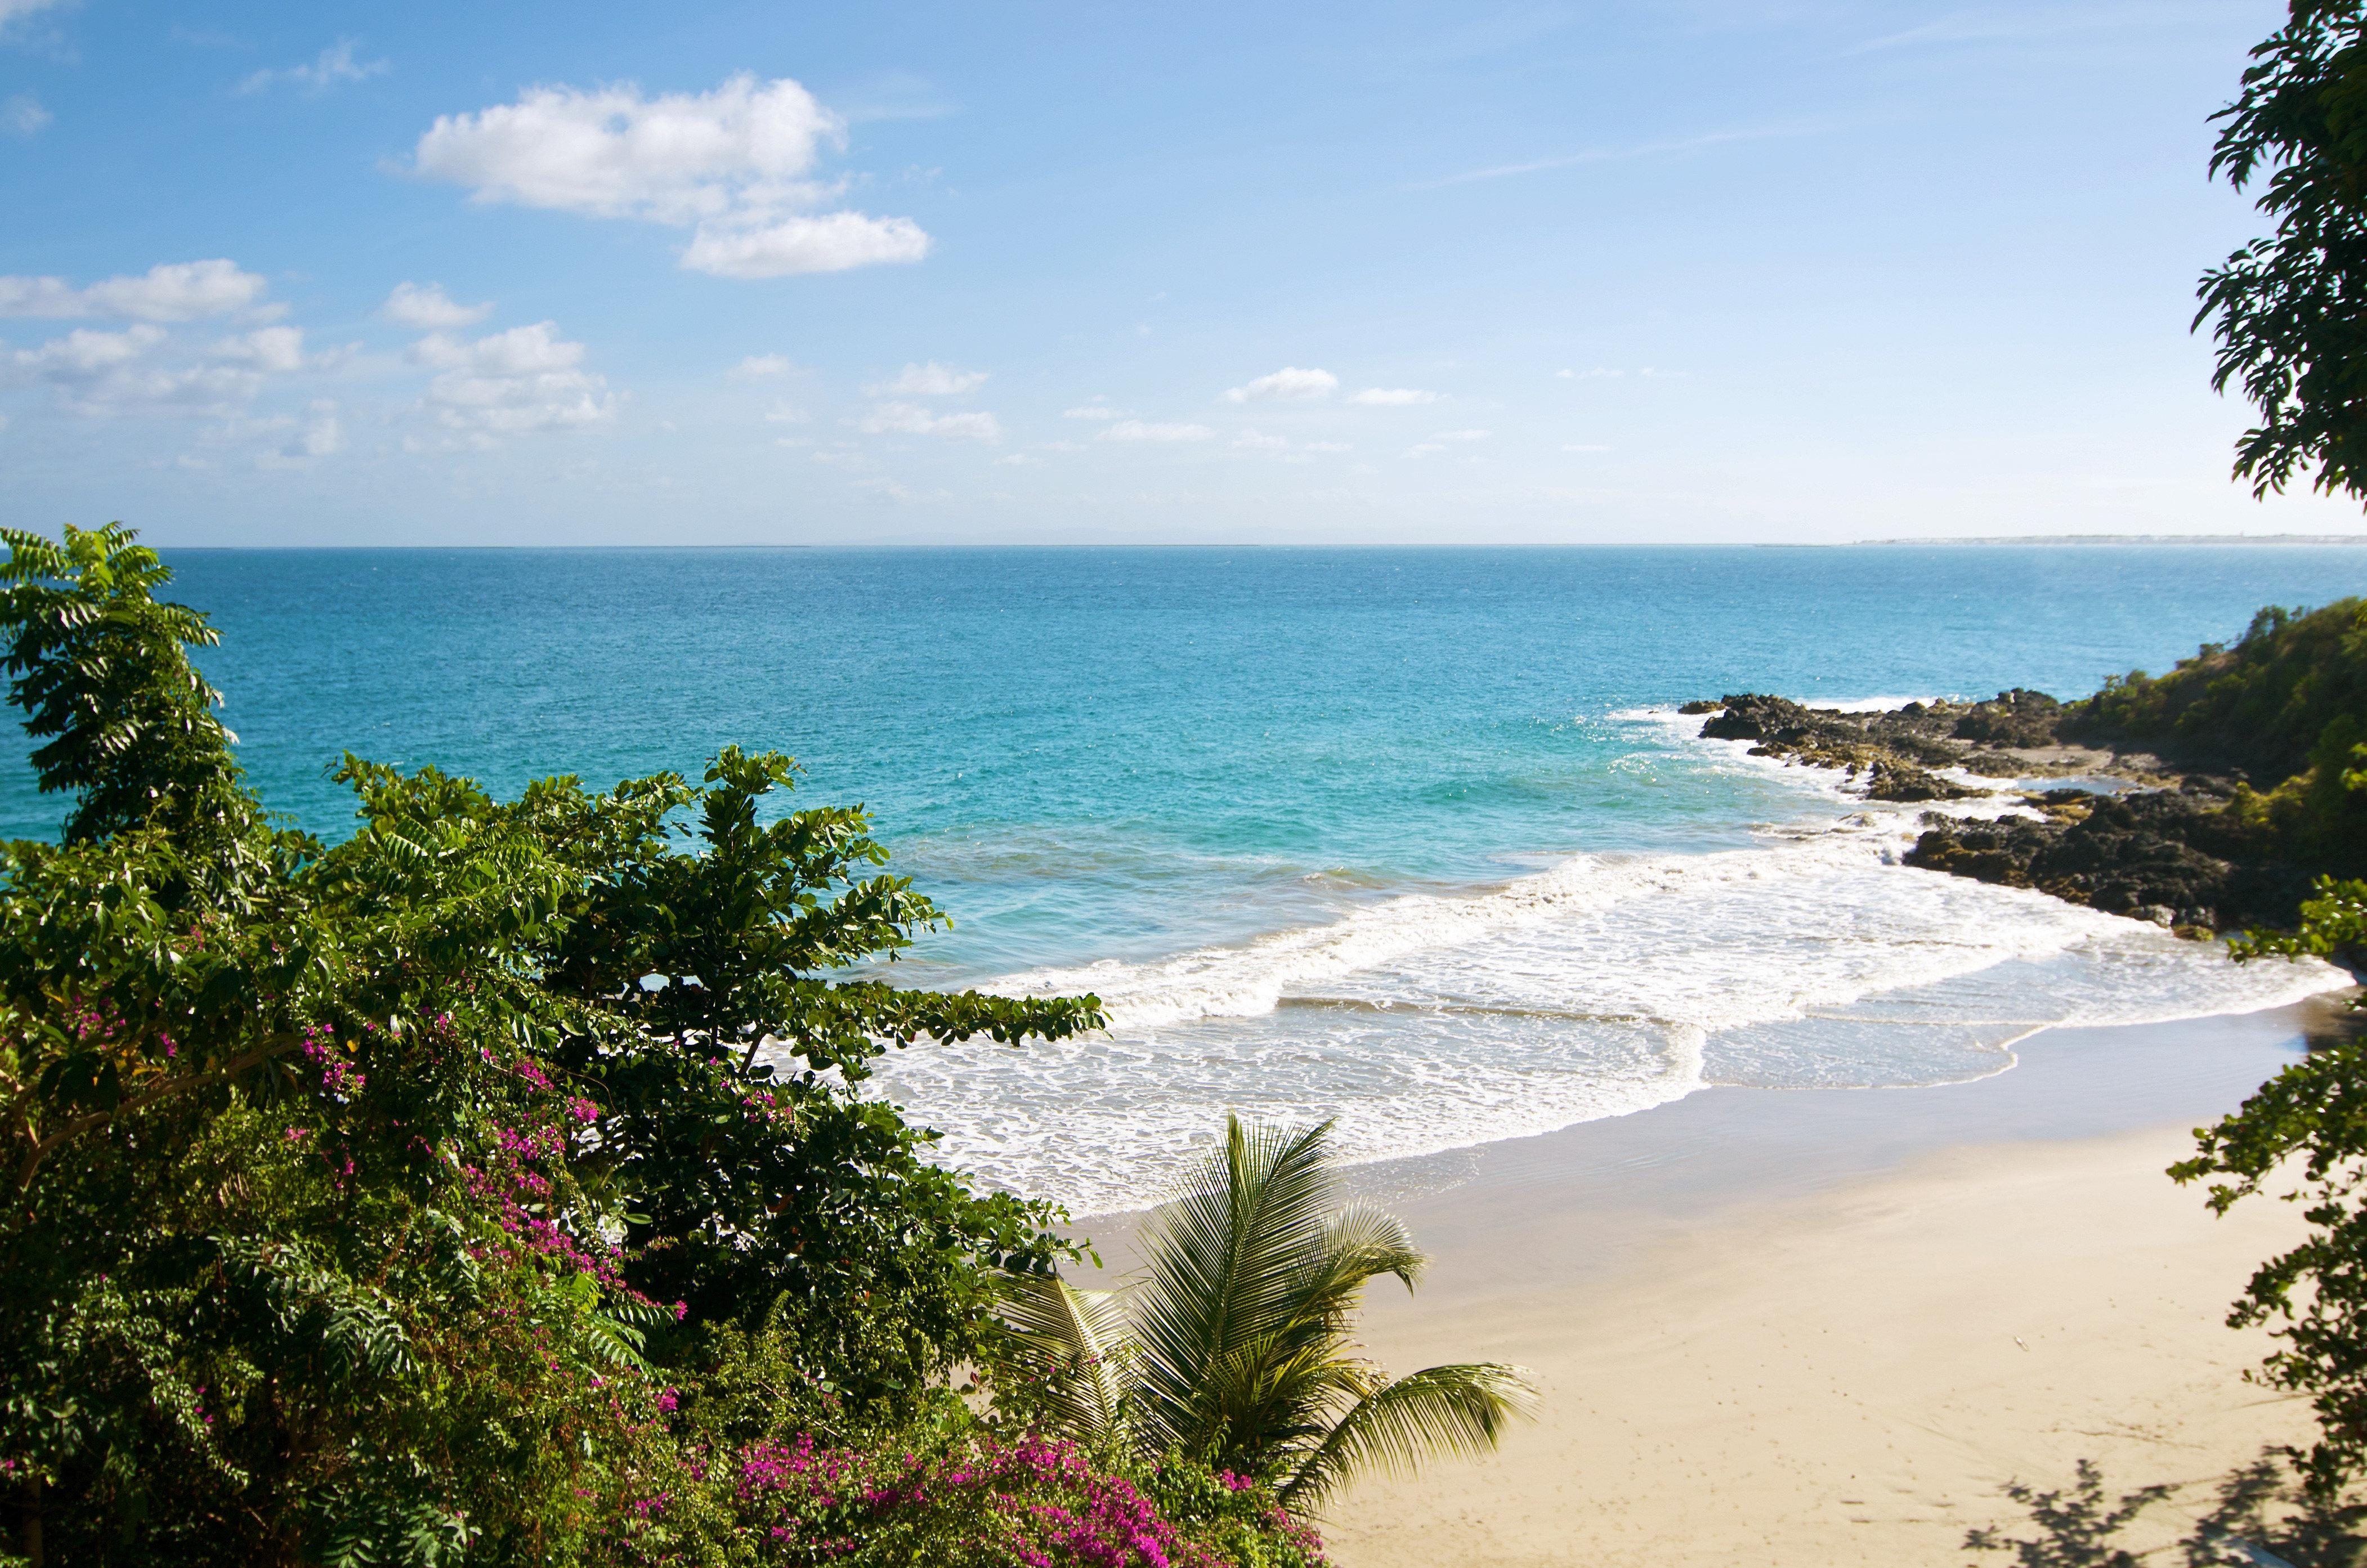 Beach Beachfront Luxury Ocean water sky tree Nature shore Sea Coast caribbean tropics overlooking cape cove terrain plant sandy Island day